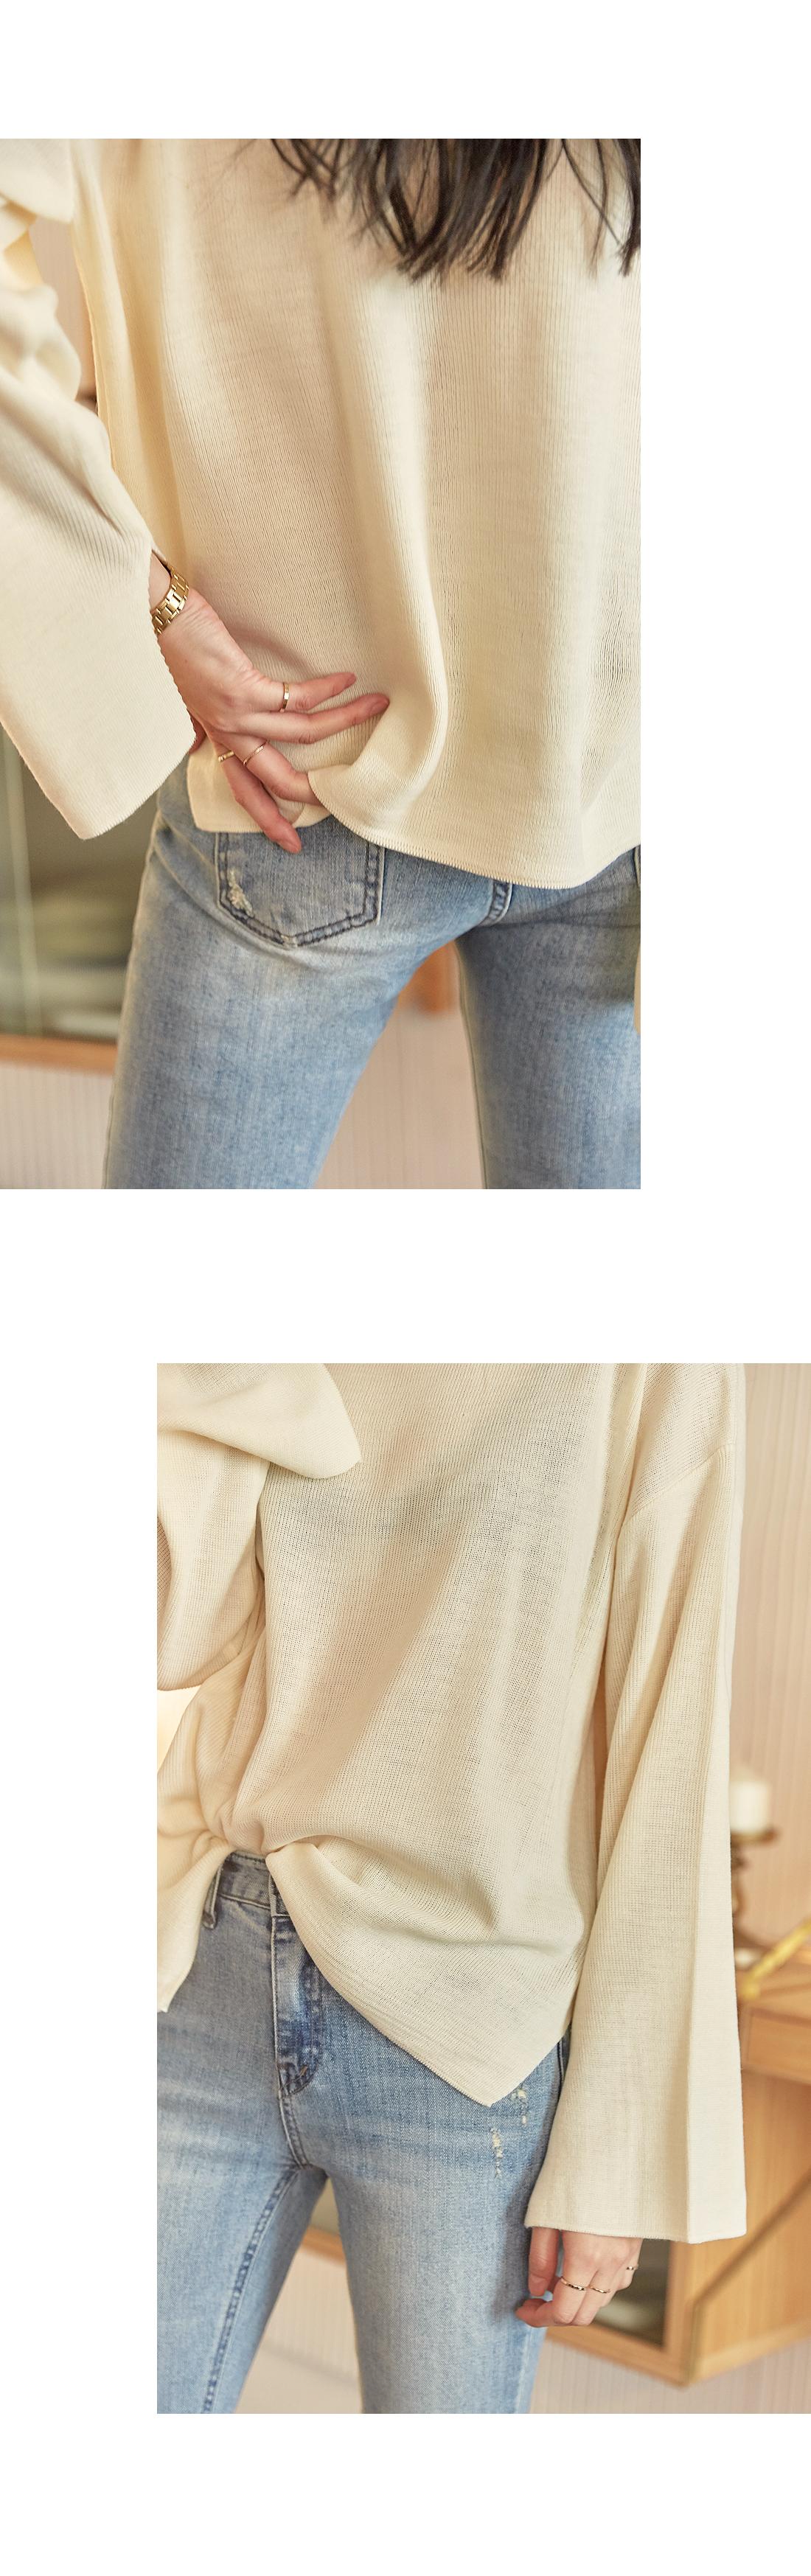 [TOP] WOMANLY LIP NECK SLIT KNIT